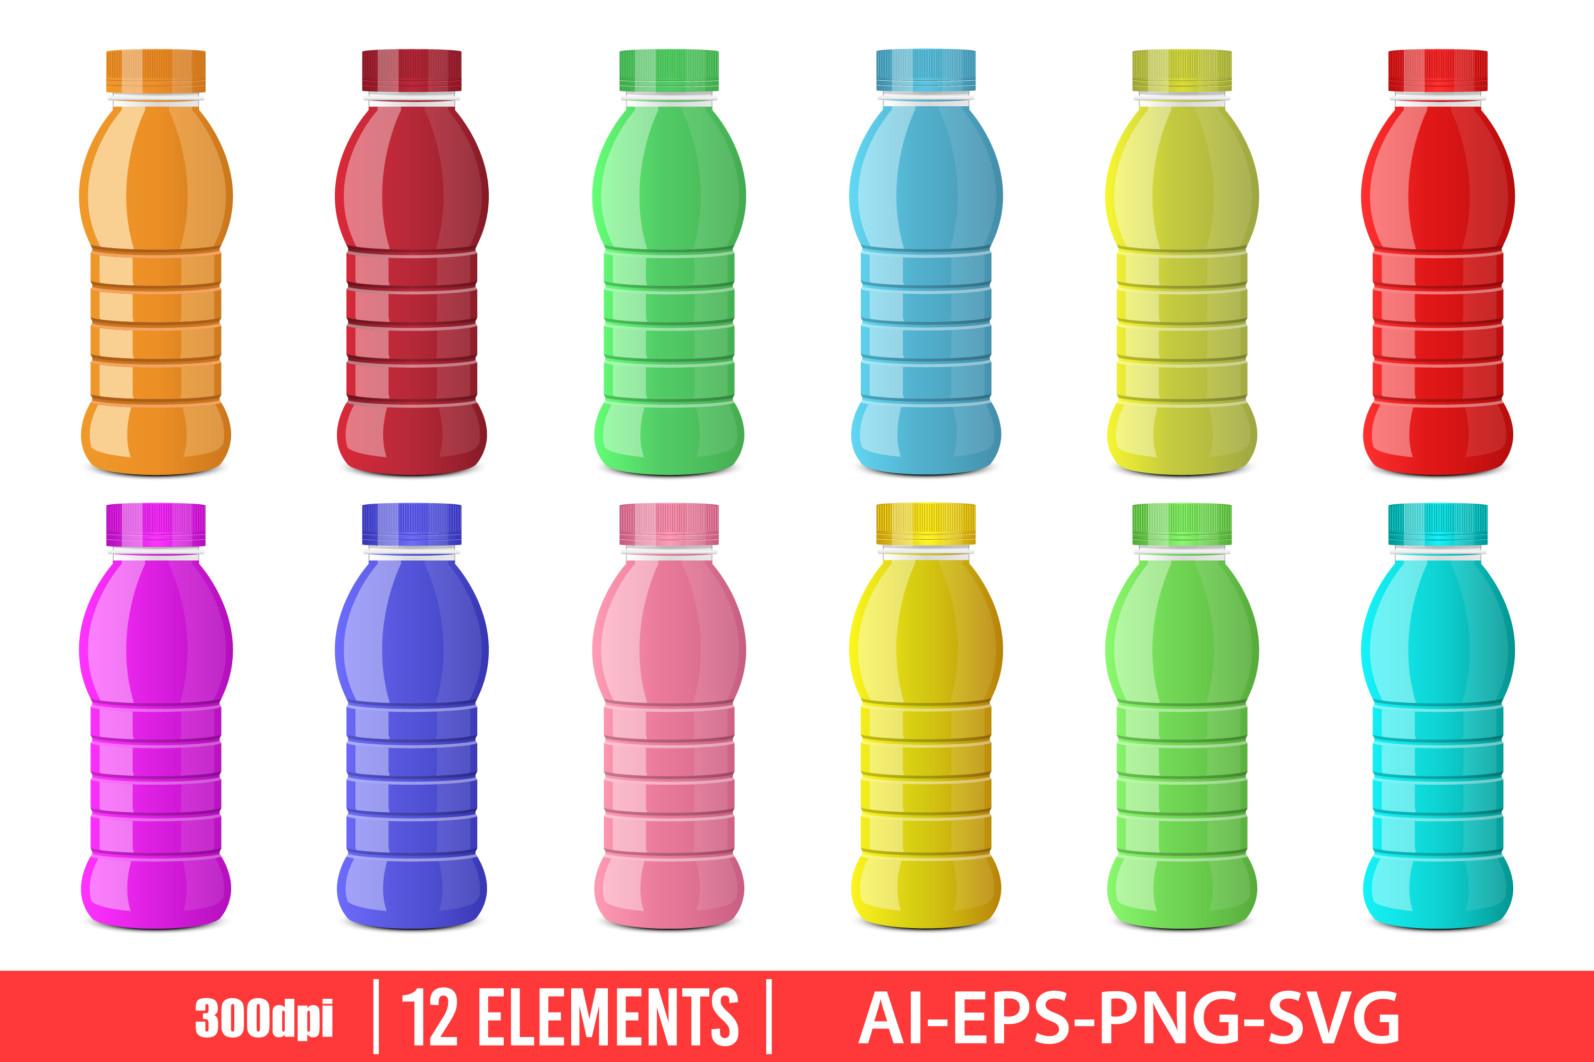 Juice bottle clipart vector design illustration. Juice bottle set. Vector Clipart Print - JUICE BOTTLE 1 scaled -